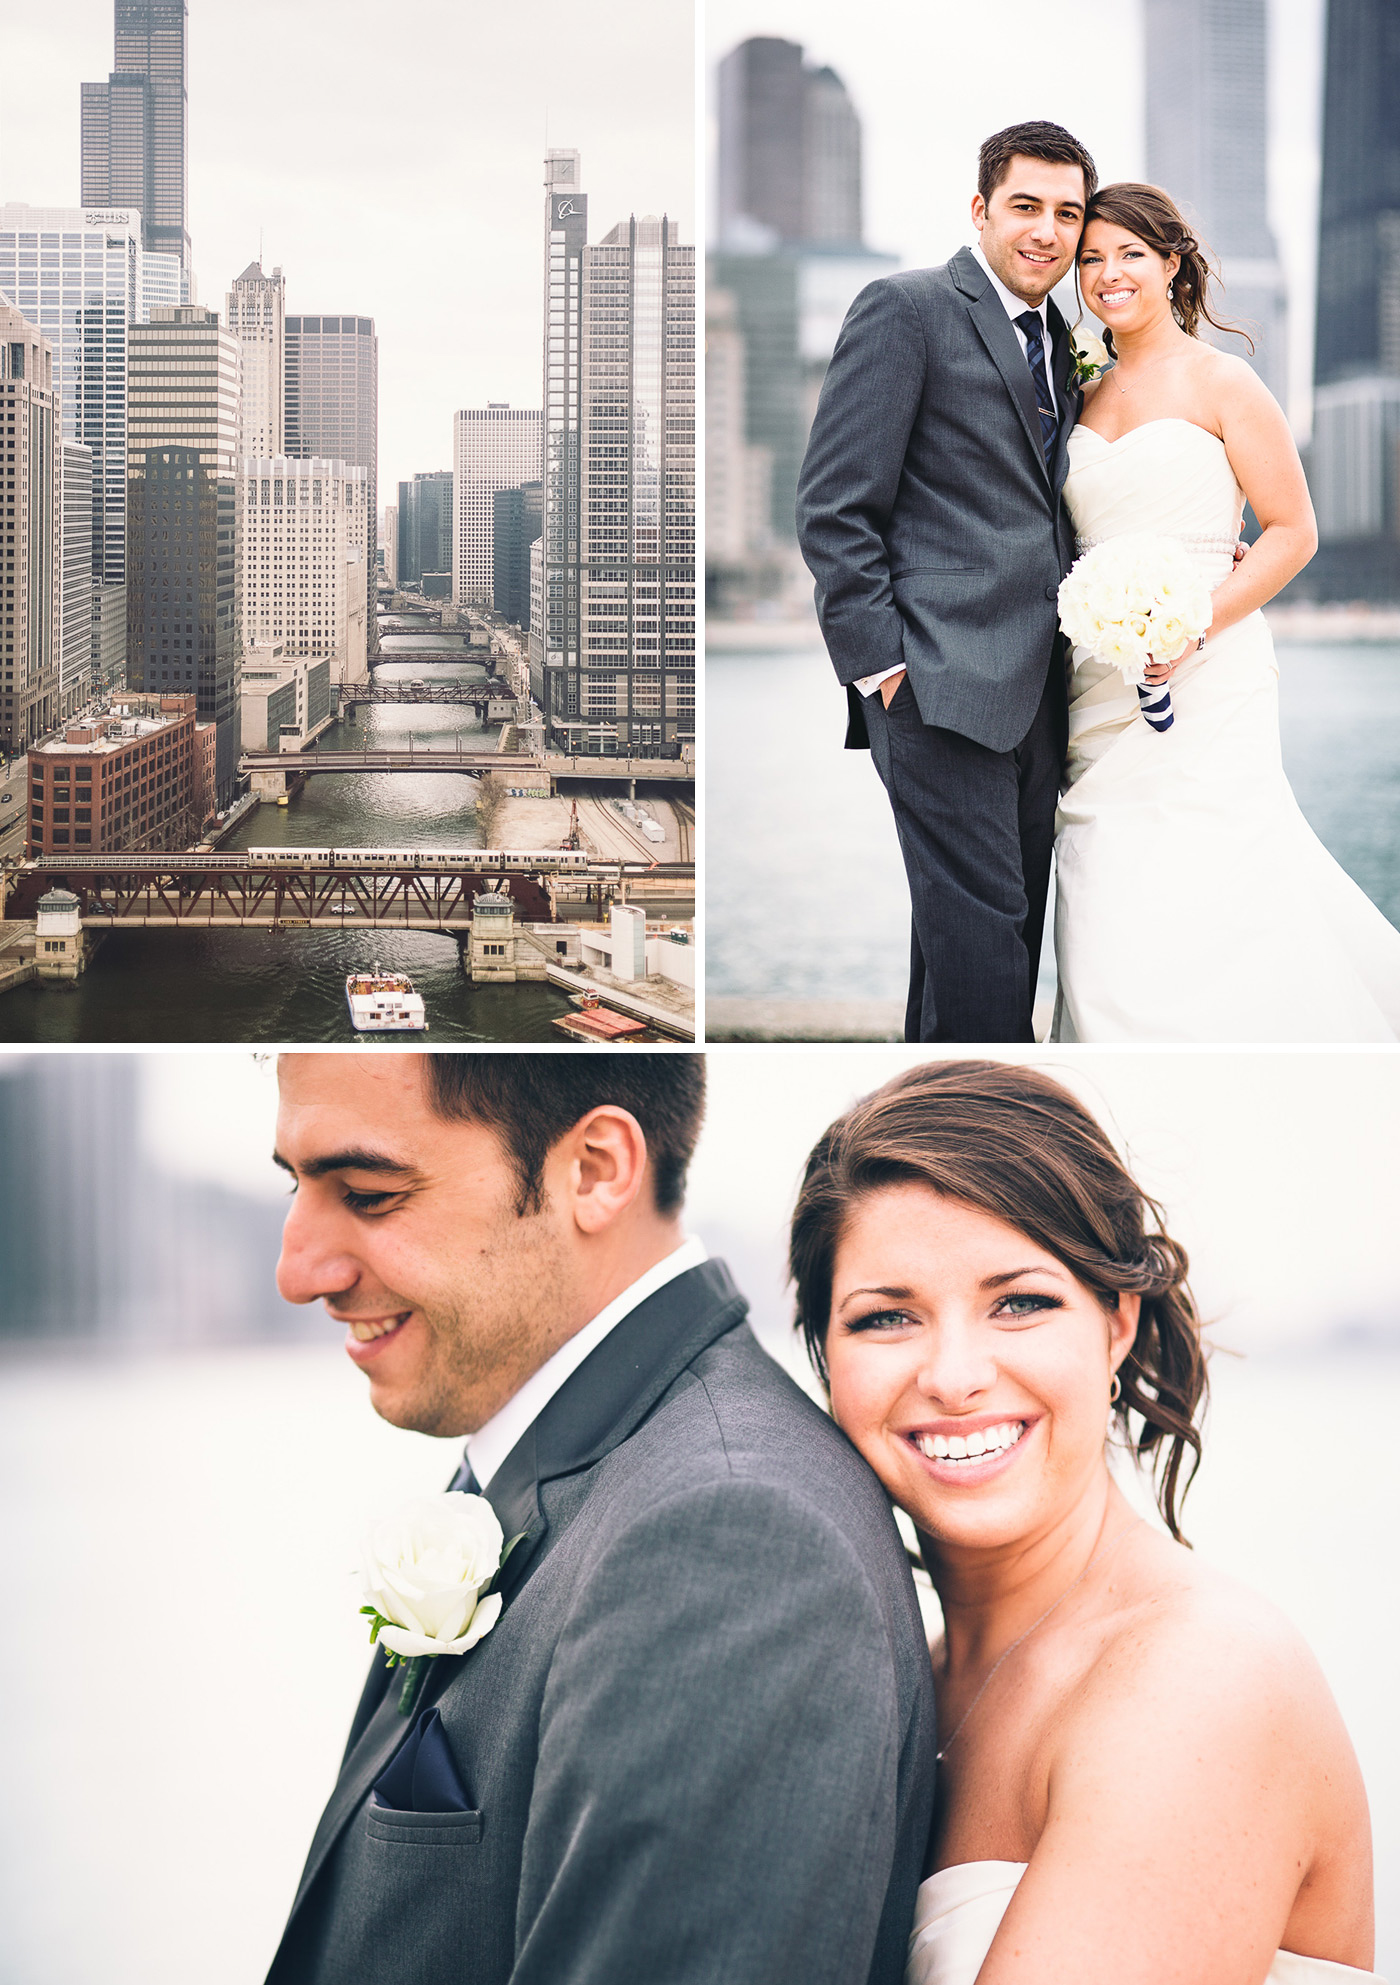 Chicago_Fine_Art_Wedding_Photography_losurdo.jpg